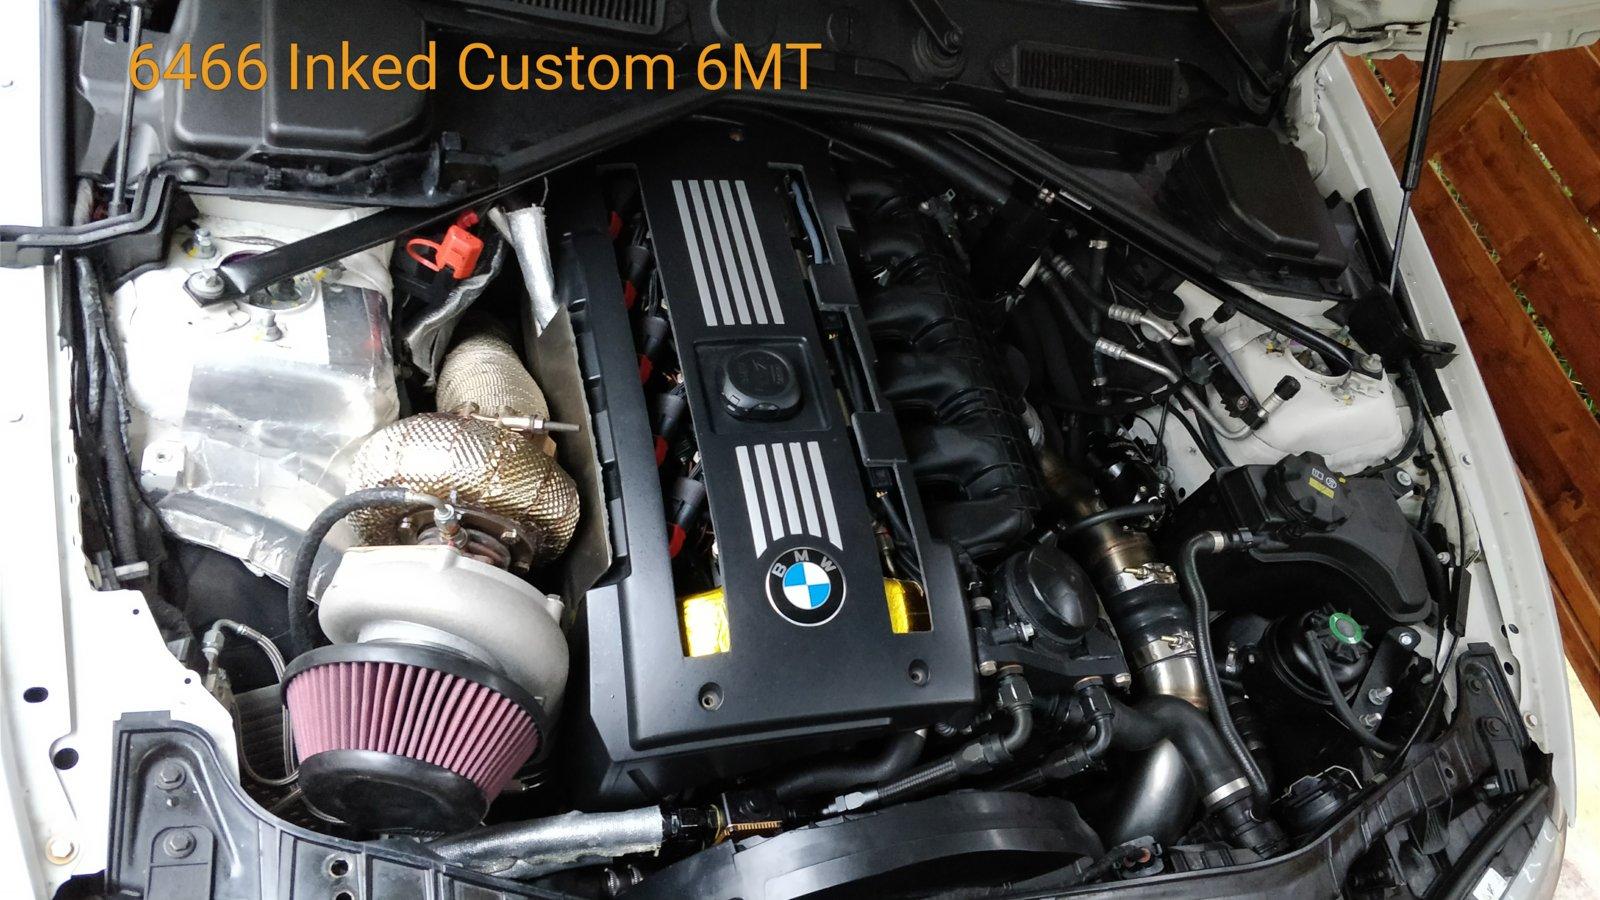 Lifestyler's 6466 135i | BMW Forums - SpoolStreet